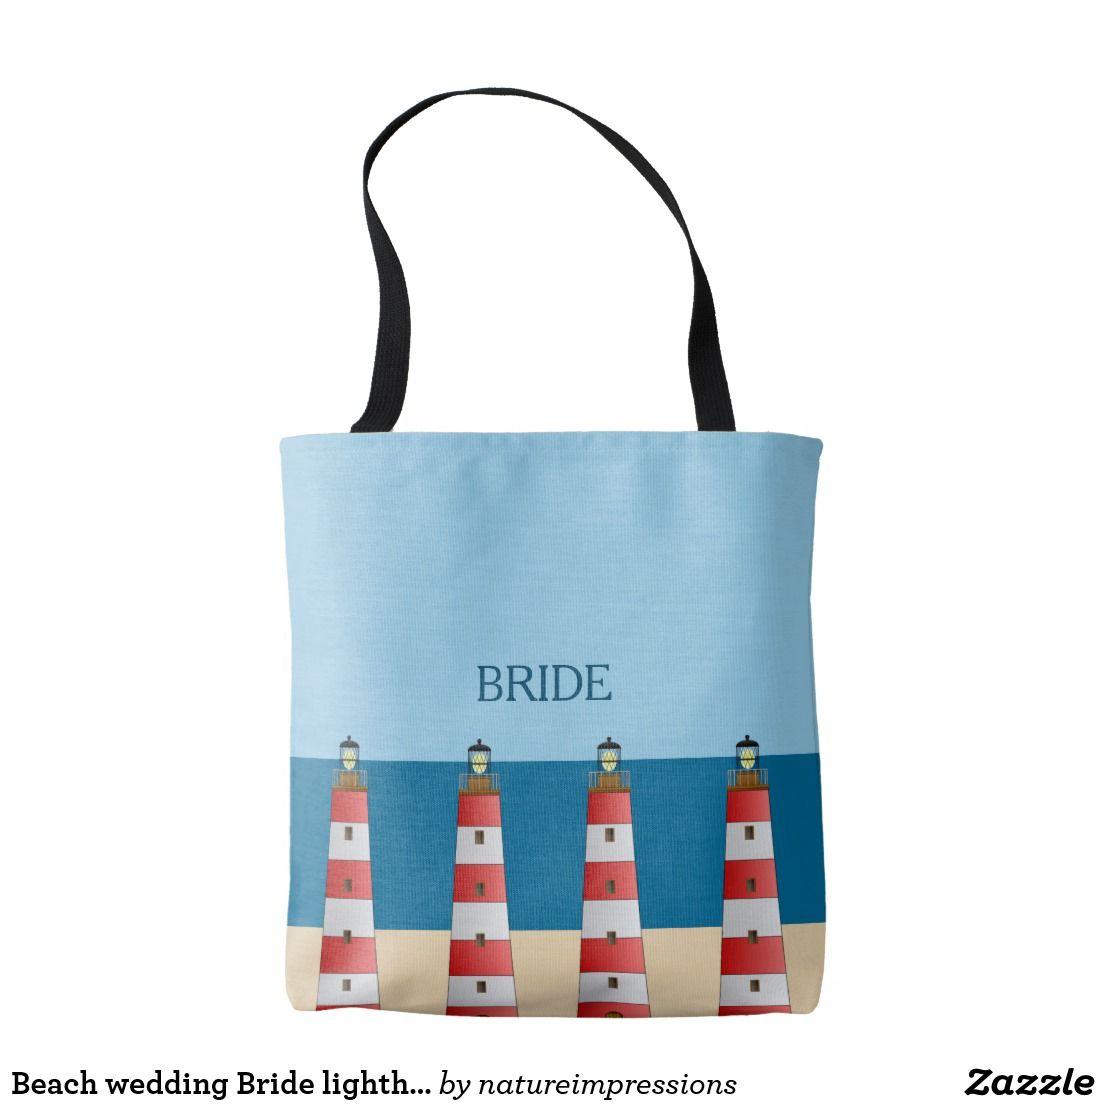 Beach wedding Bride lighthouses sand sea sky Tote Bag